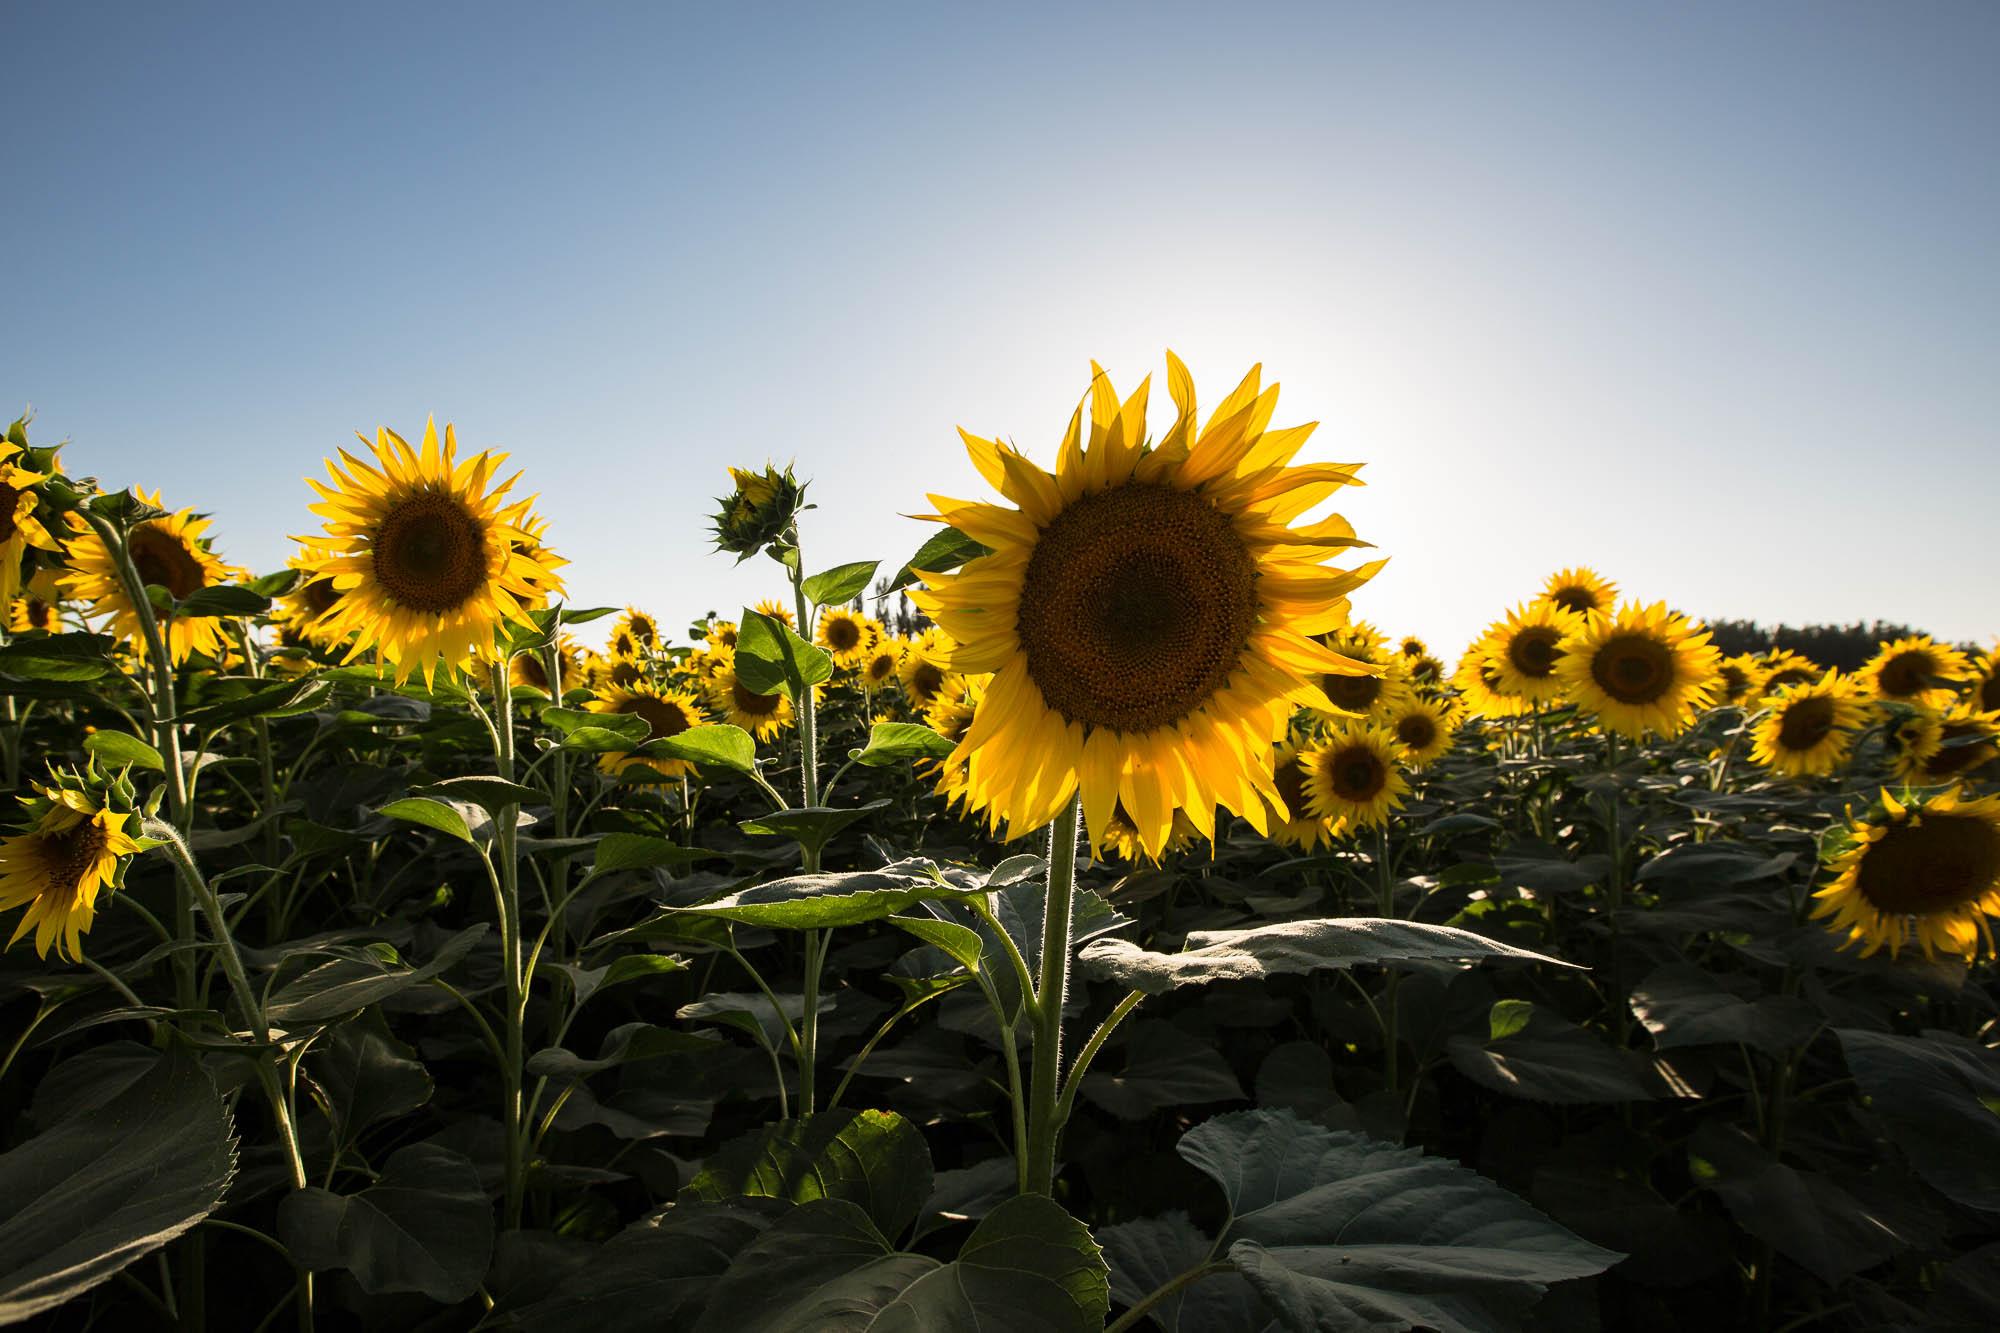 big fat sunflower